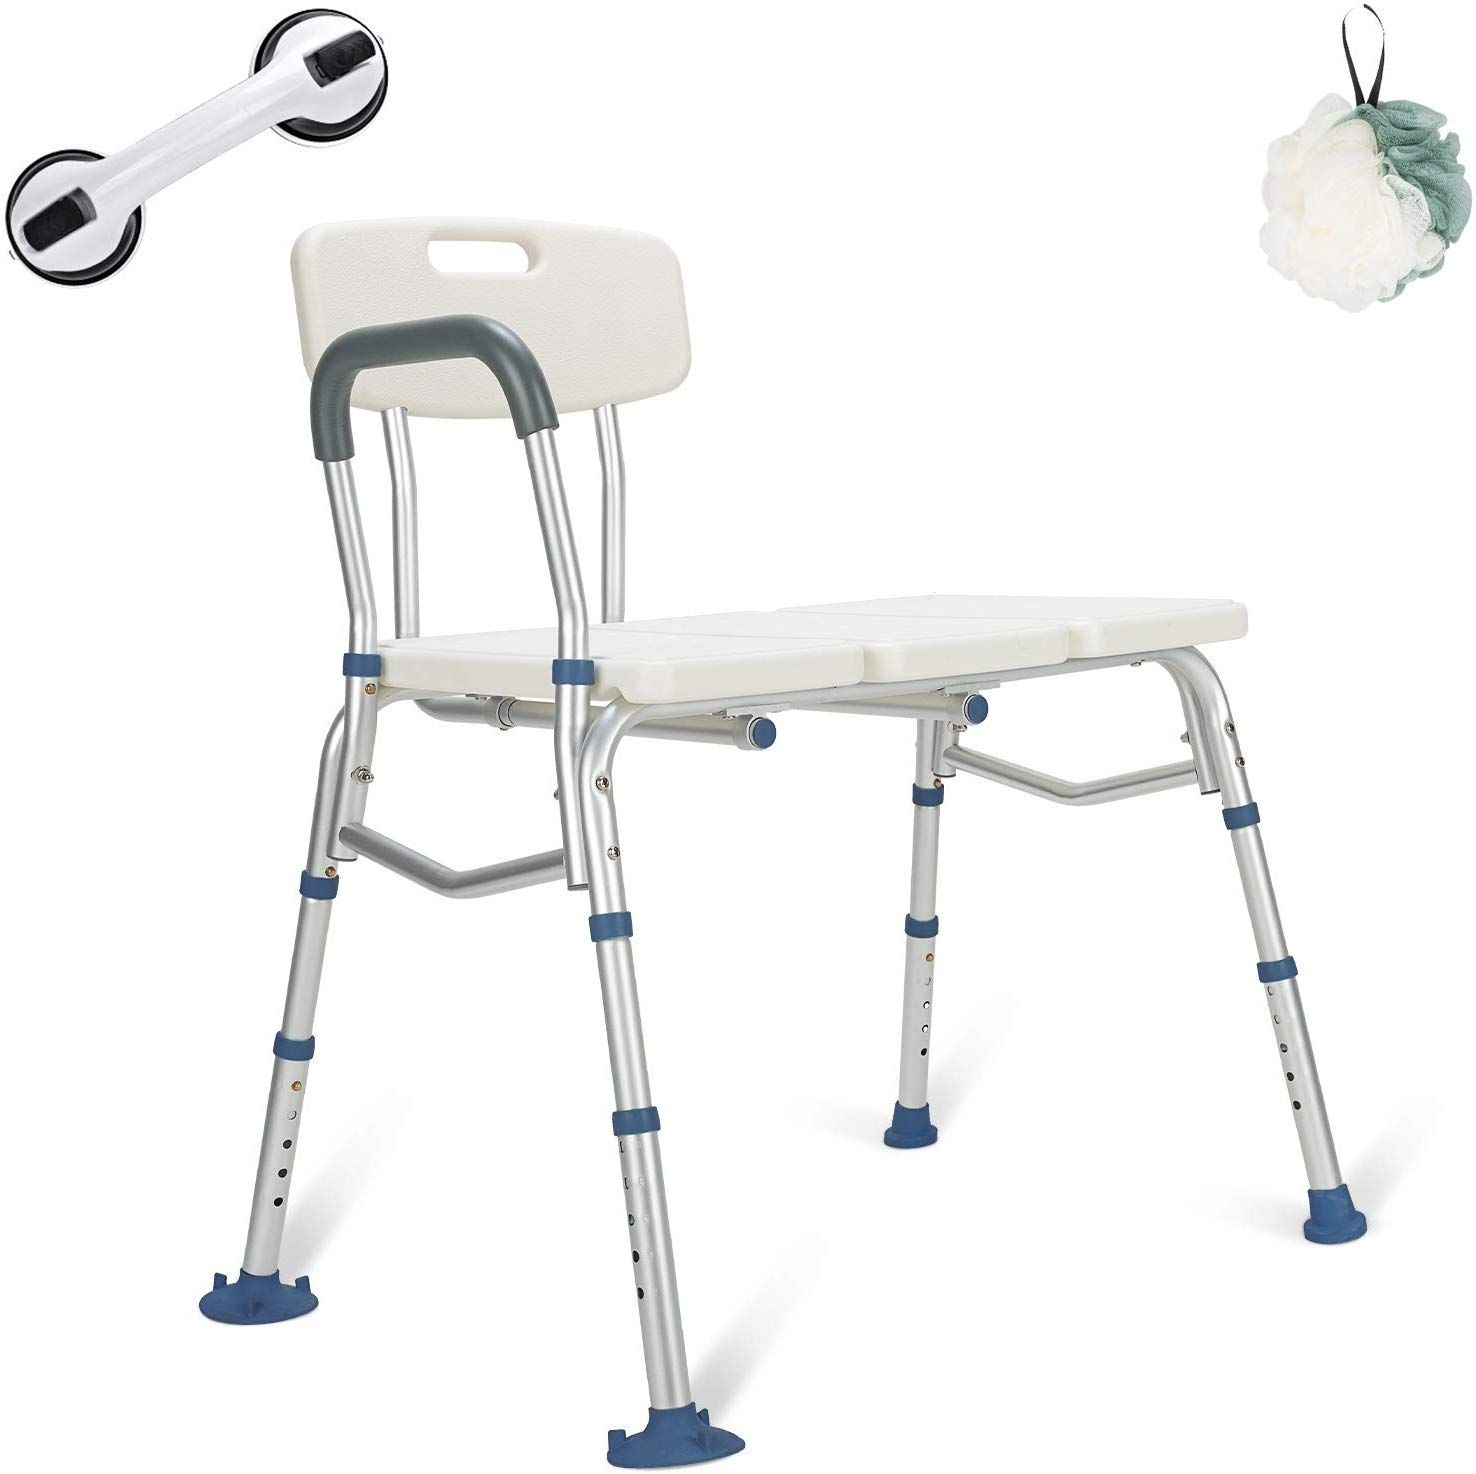 Amazon Com Greenchief Bariatric Tub Transfer Bench 400 Lb Heavy Duty Bath Shower Assist Adjustable Ha Handicap Shower Shower Chair Handicap Shower Chair